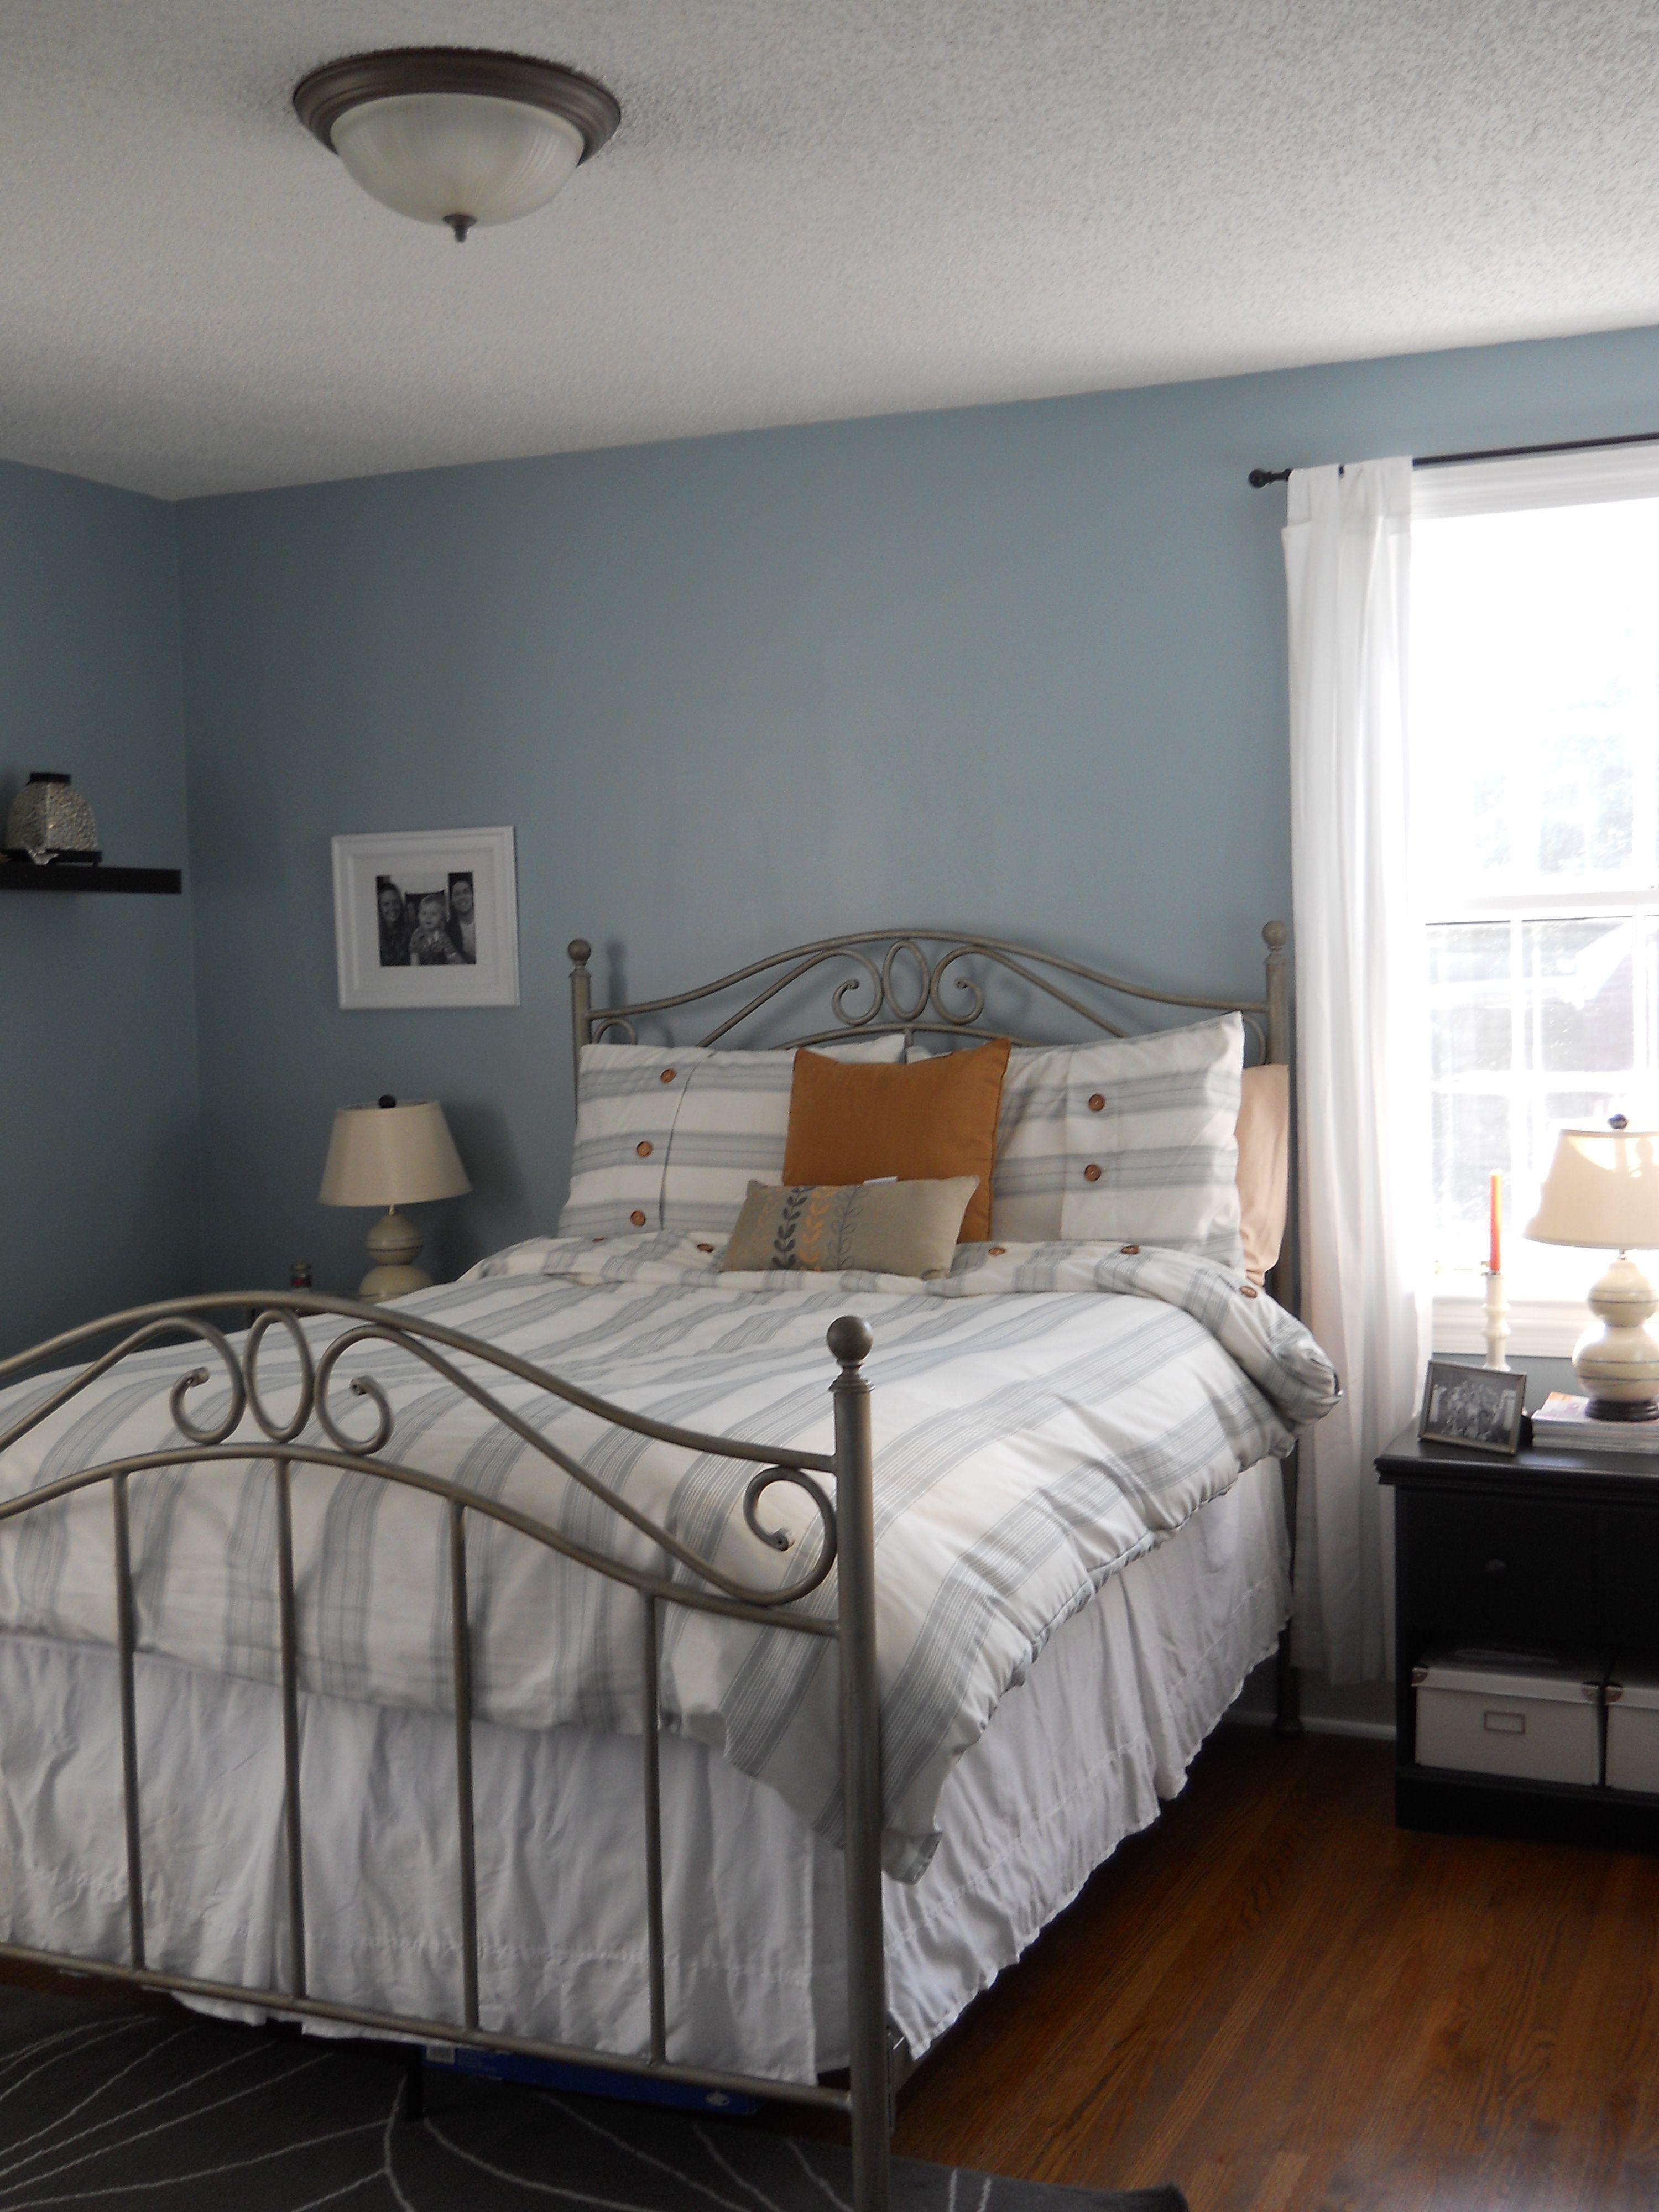 Slate Blue Bedroom Walls Slate Blue Bedroom Walls bedroom